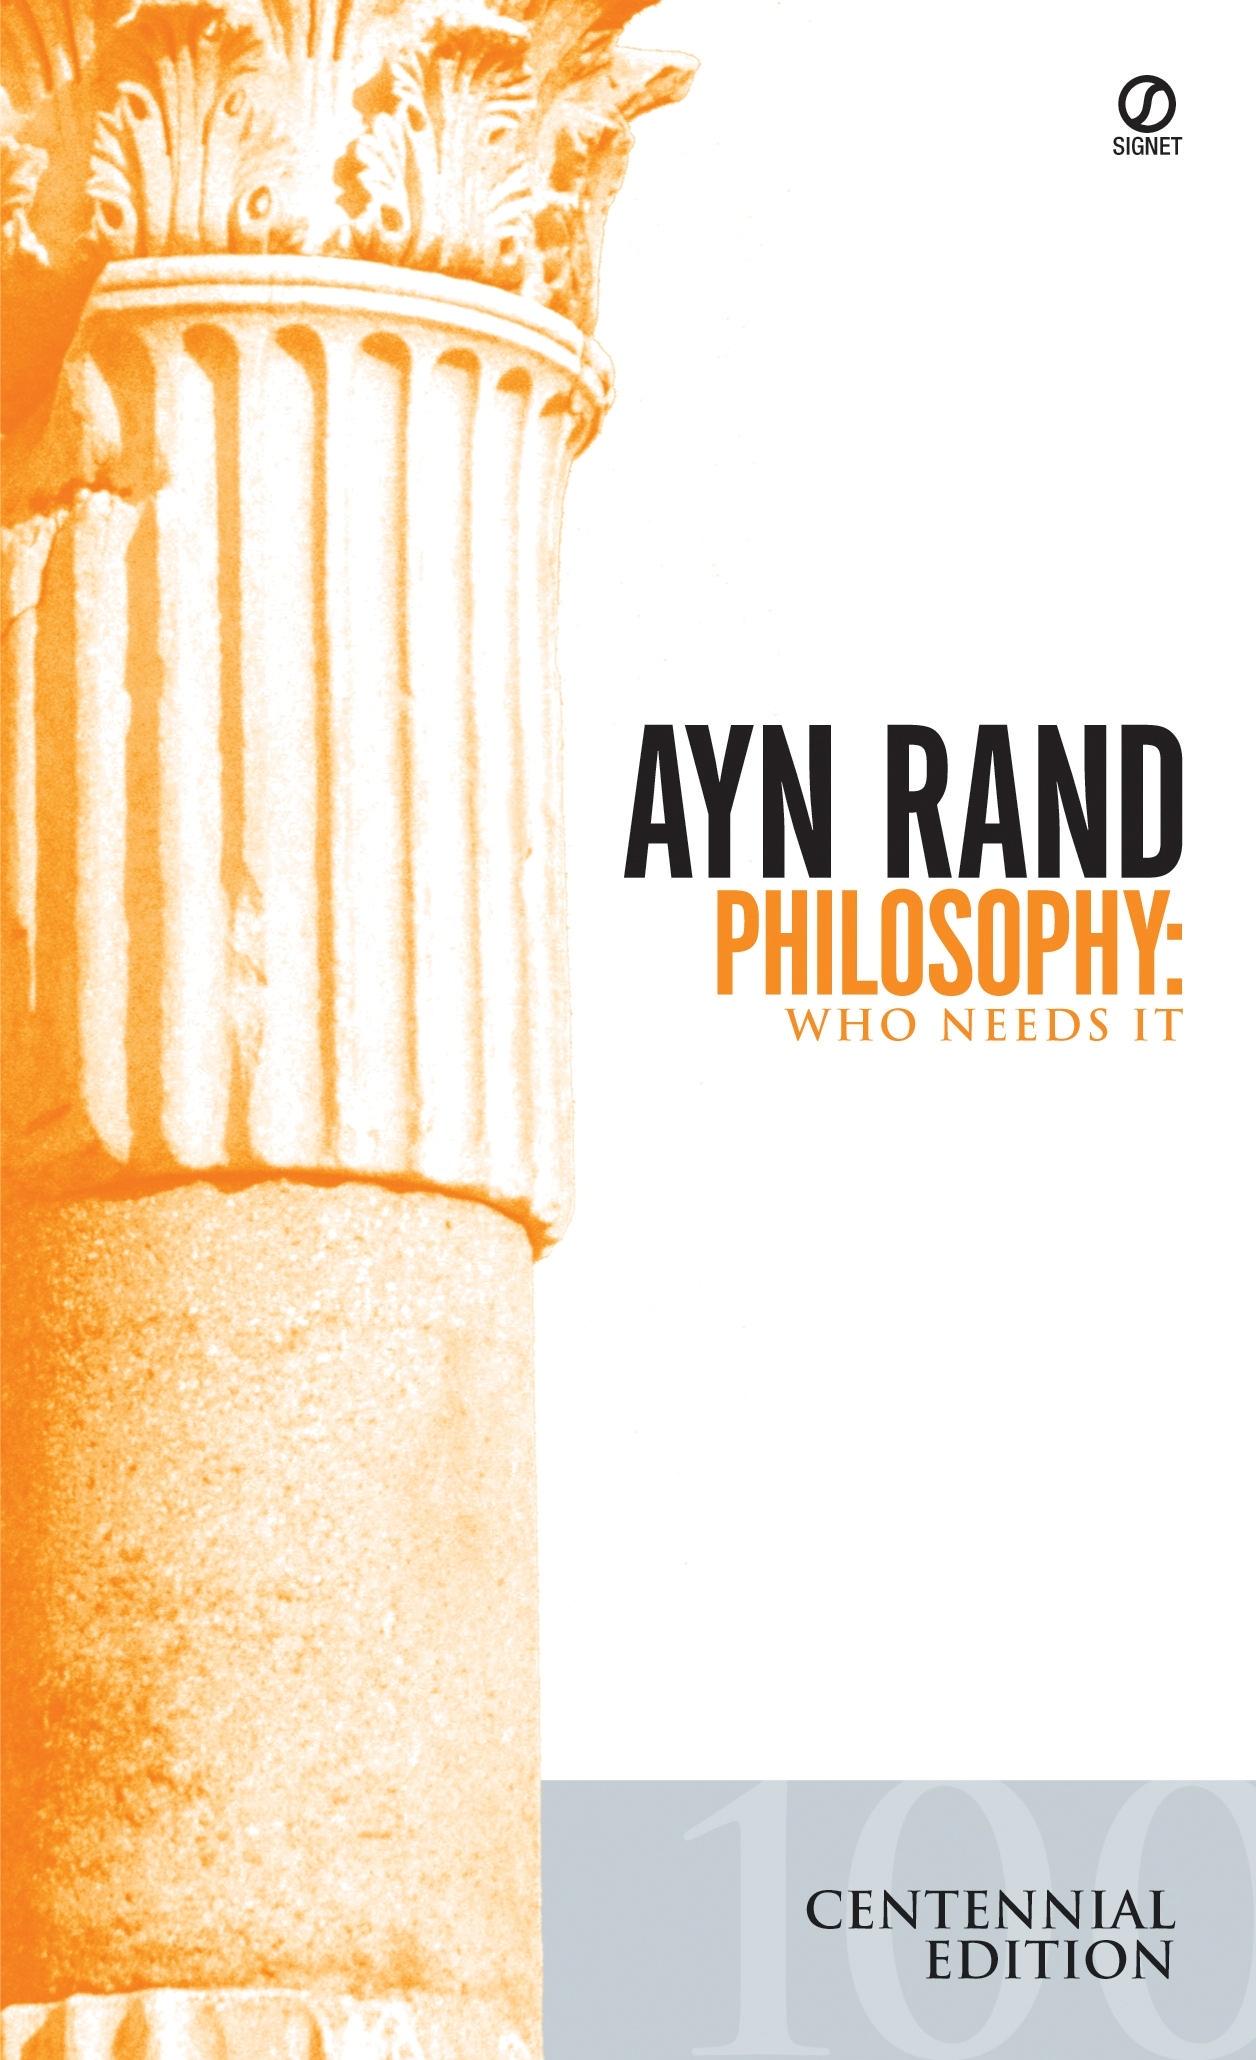 Philosophy: Who Needs It